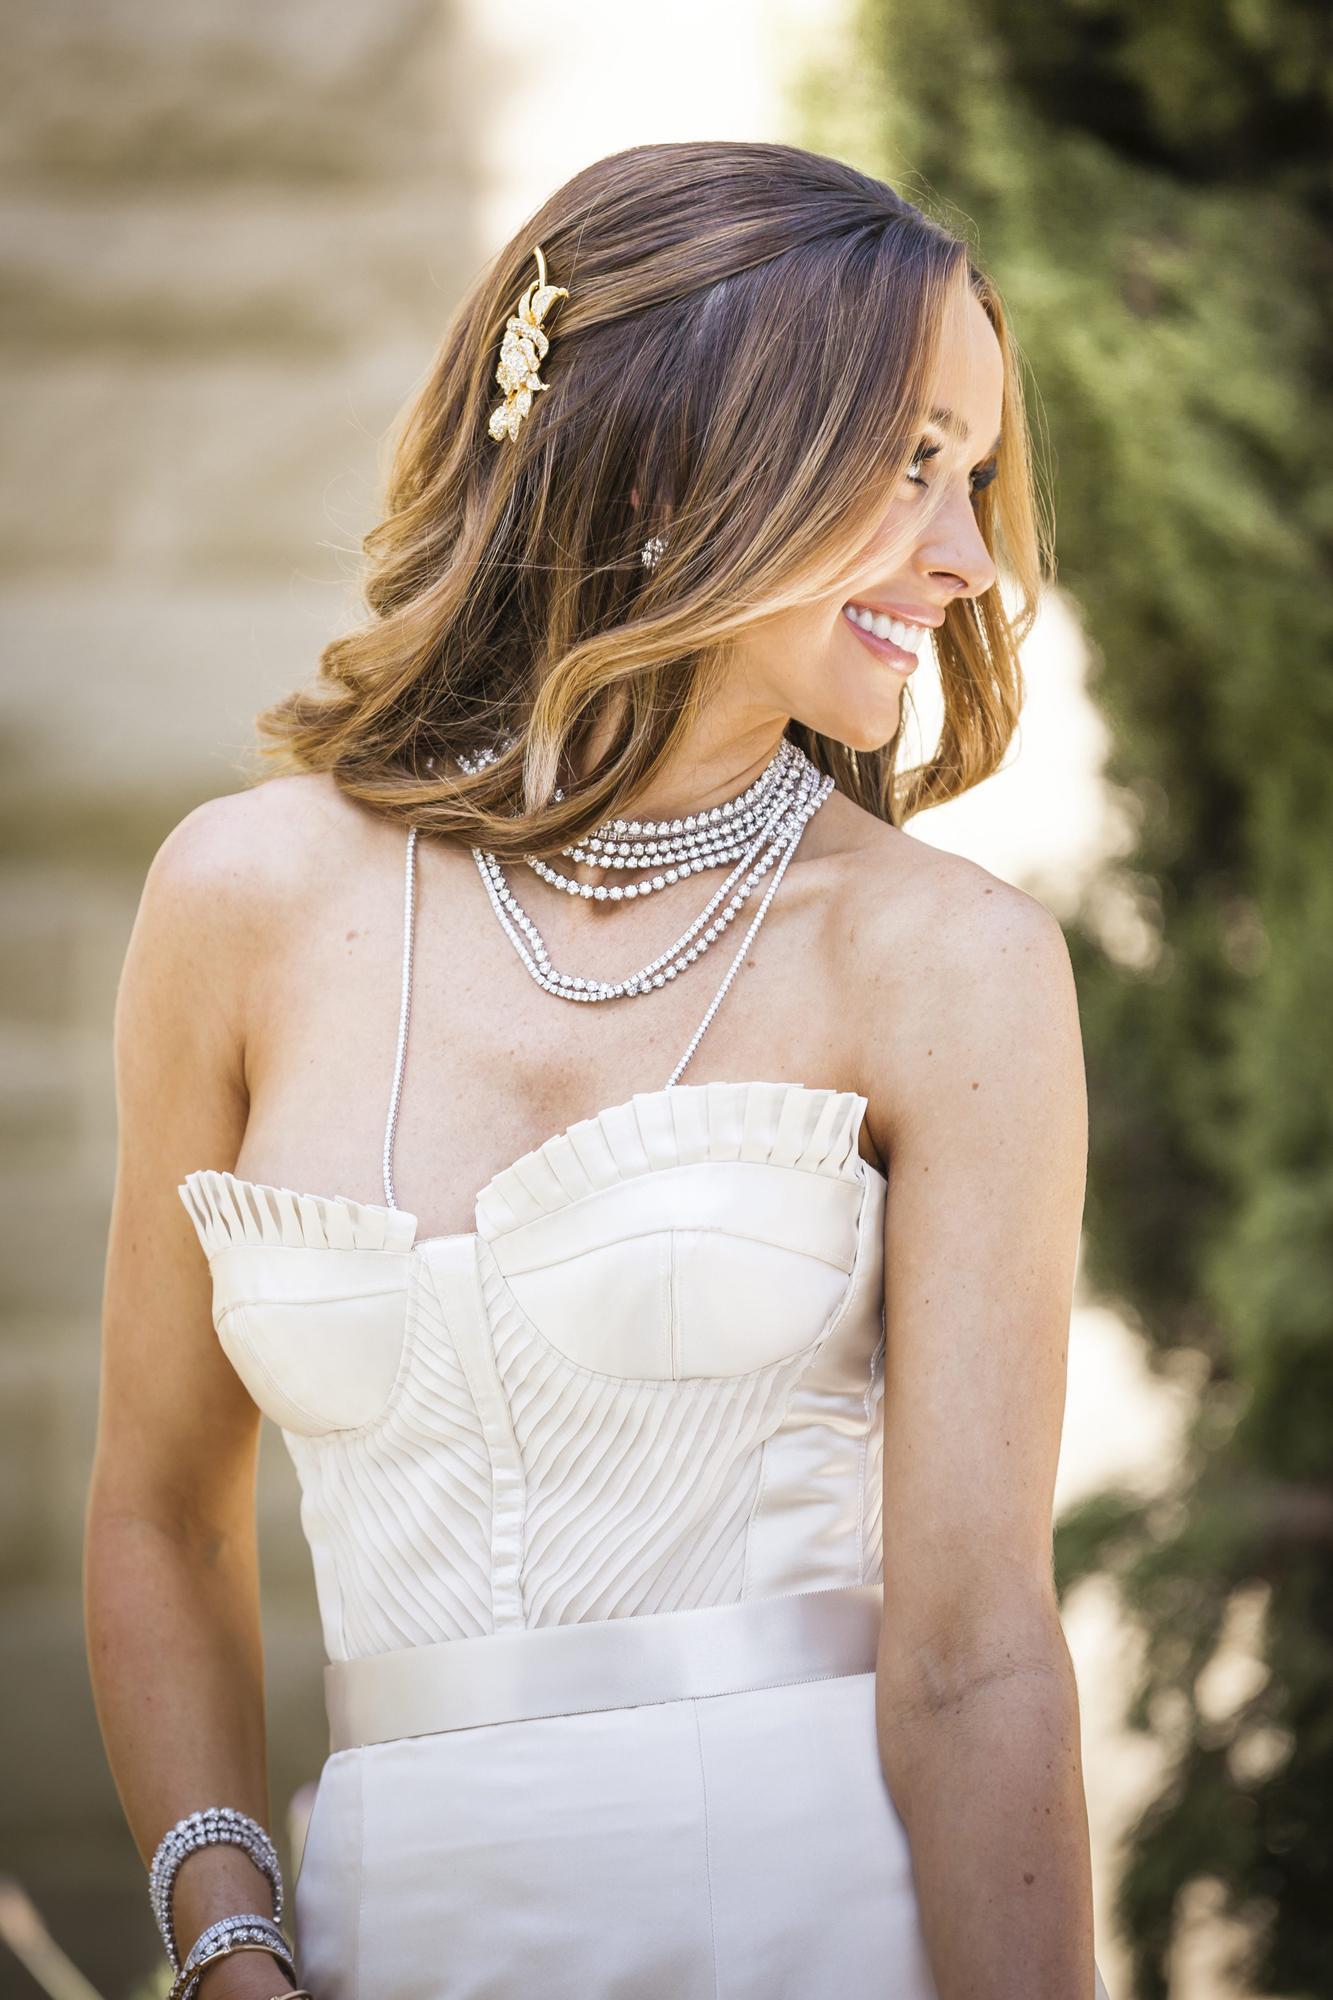 Courtney Bingham gold hair accessory headpiece Nikki Sixx Motley Crue